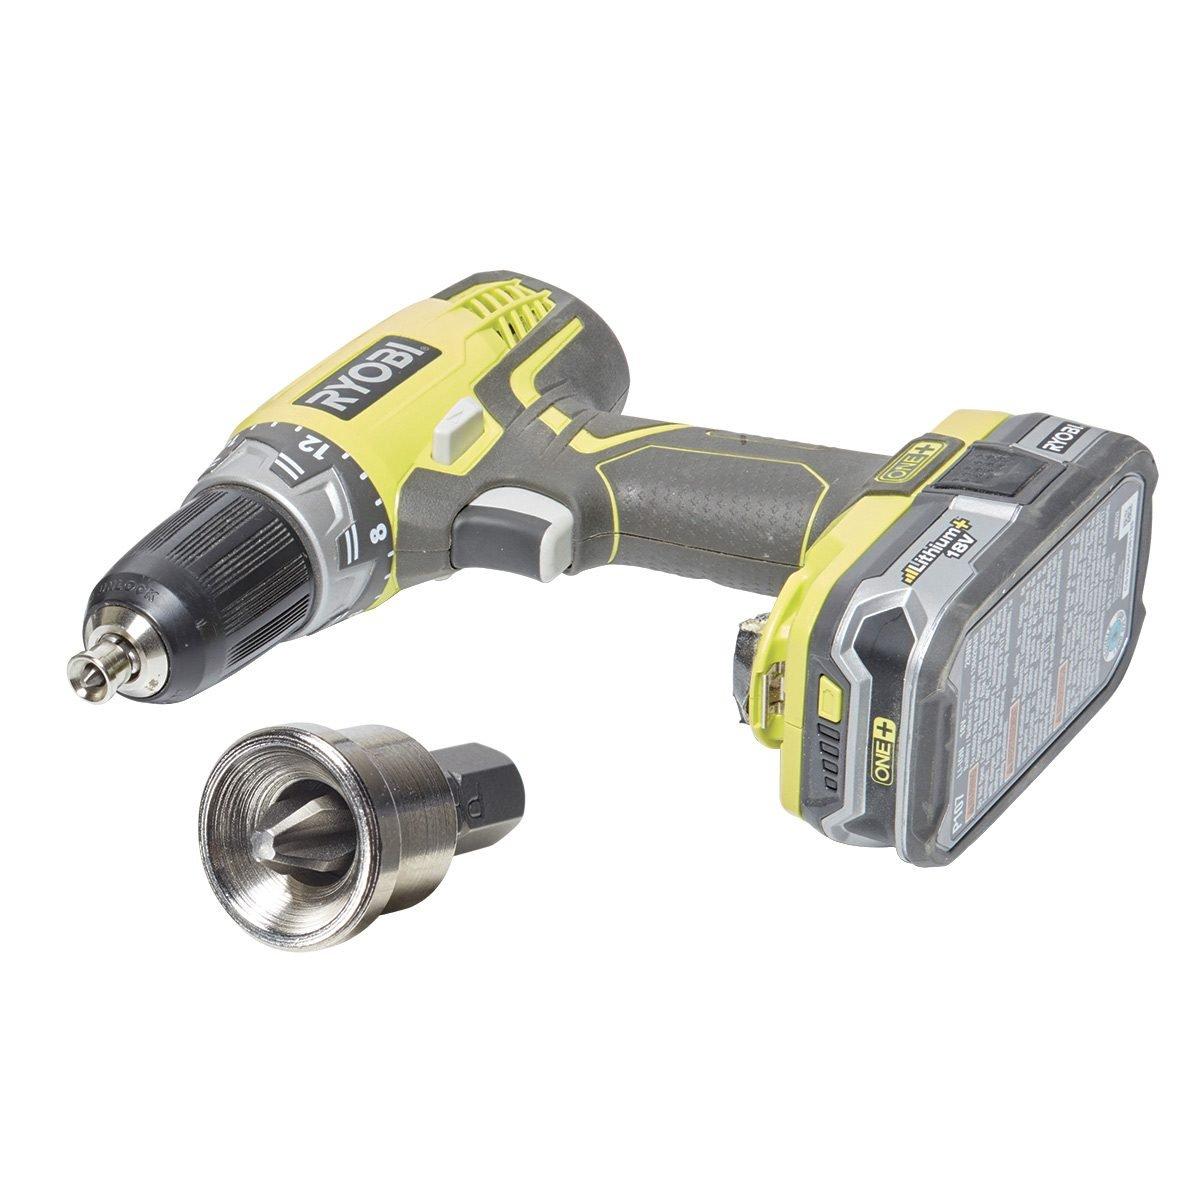 Adapter For Cordless Drywall Gun